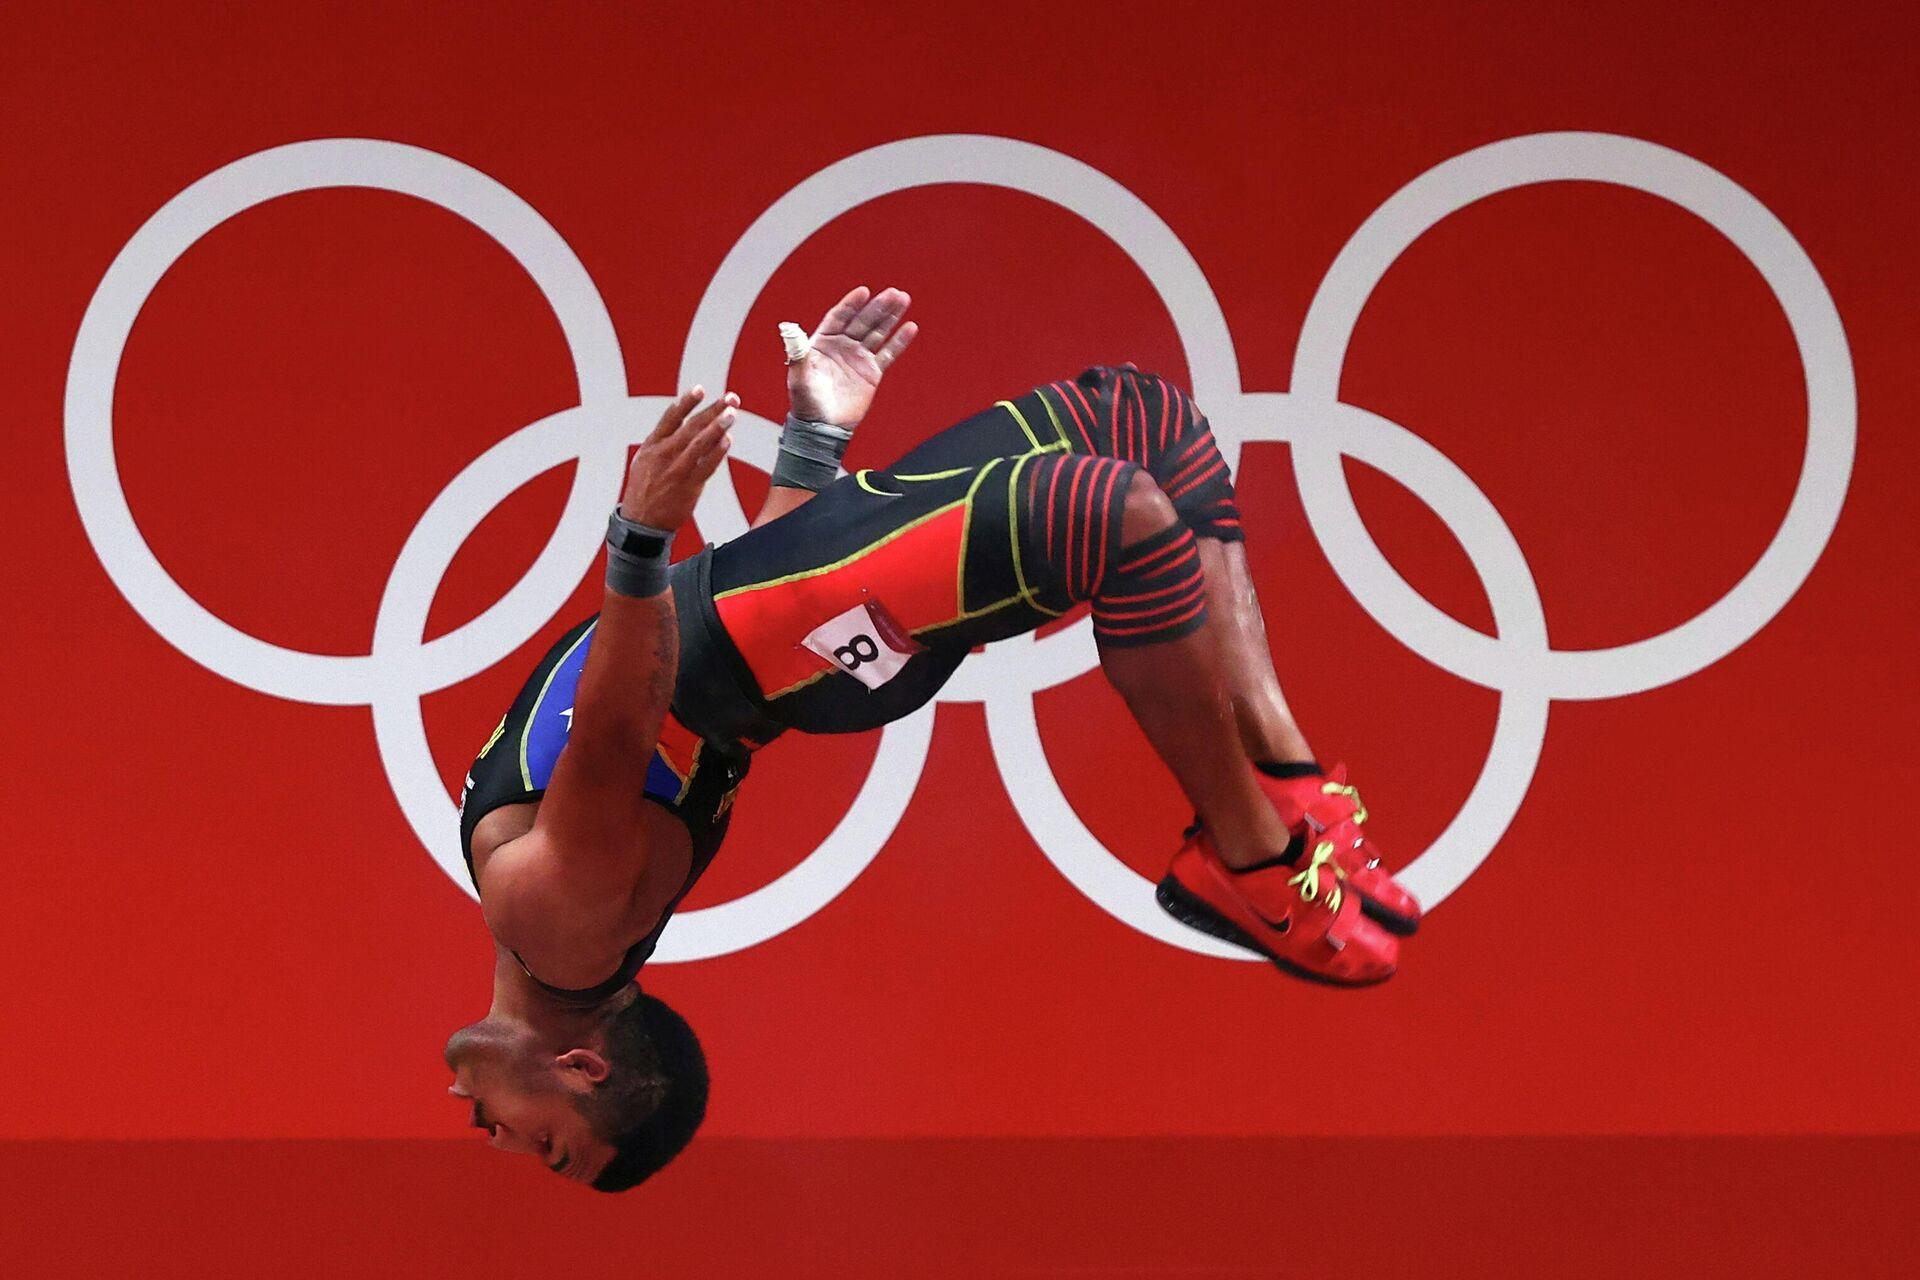 Tokyo 2020 Olympics - Weightlifting - Men's 73kg - Group A - Tokyo International Forum, Tokyo, Japan - July 28, 2021. Julio Mayora of Venezuela celebrates. REUTERS/Edgard Garrido     TPX IMAGES OF THE DAY - Sputnik Mundo, 1920, 30.07.2021